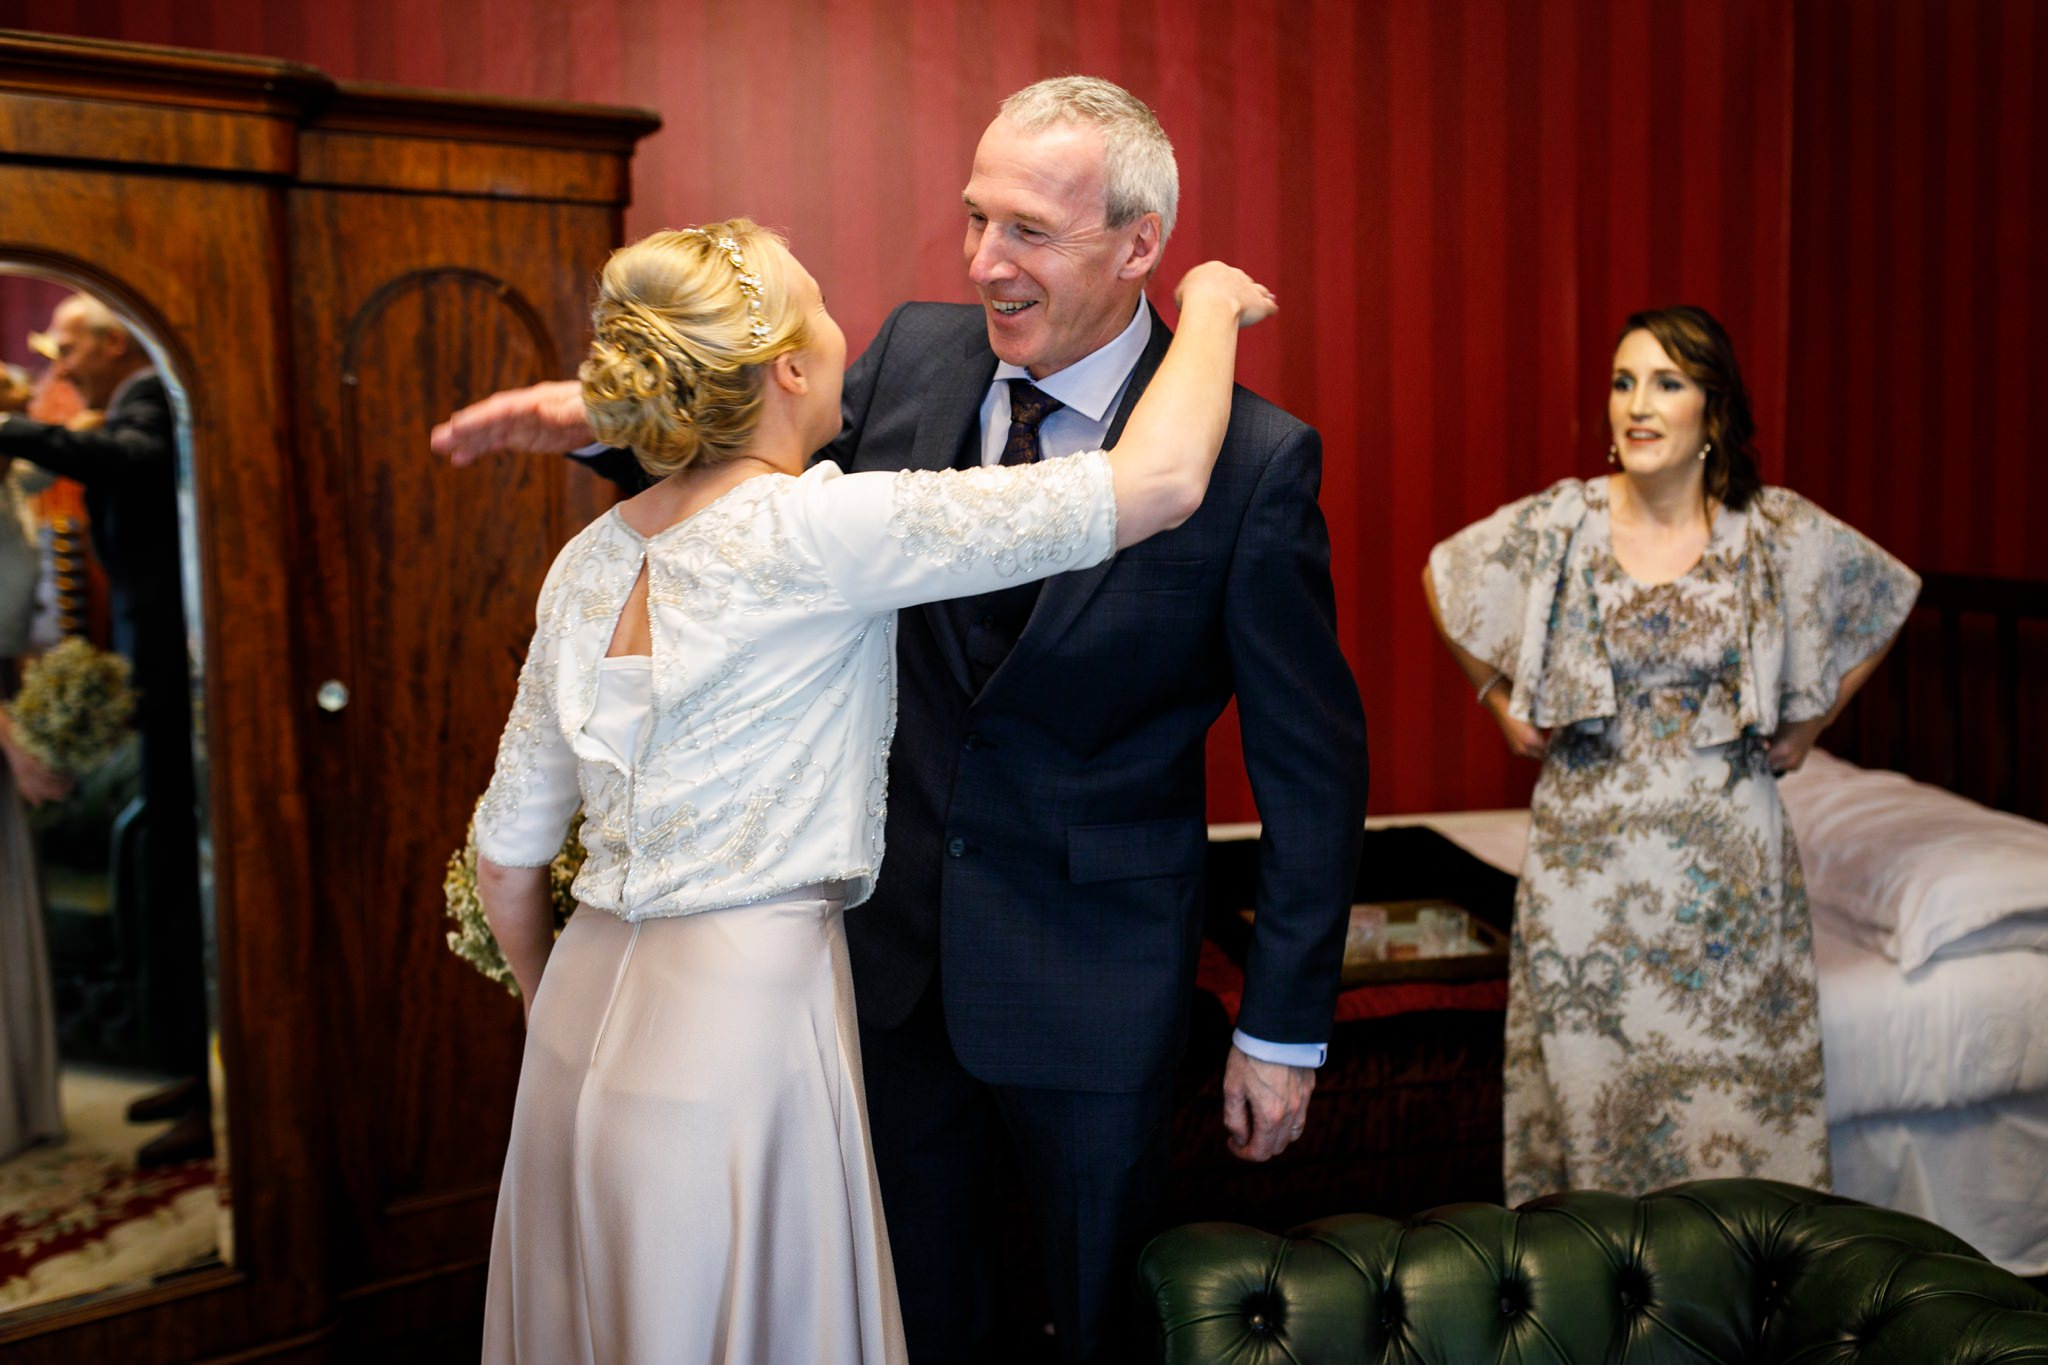 Elisha-Clarke-Photography-Dublin-City-Wedding_0050.jpg